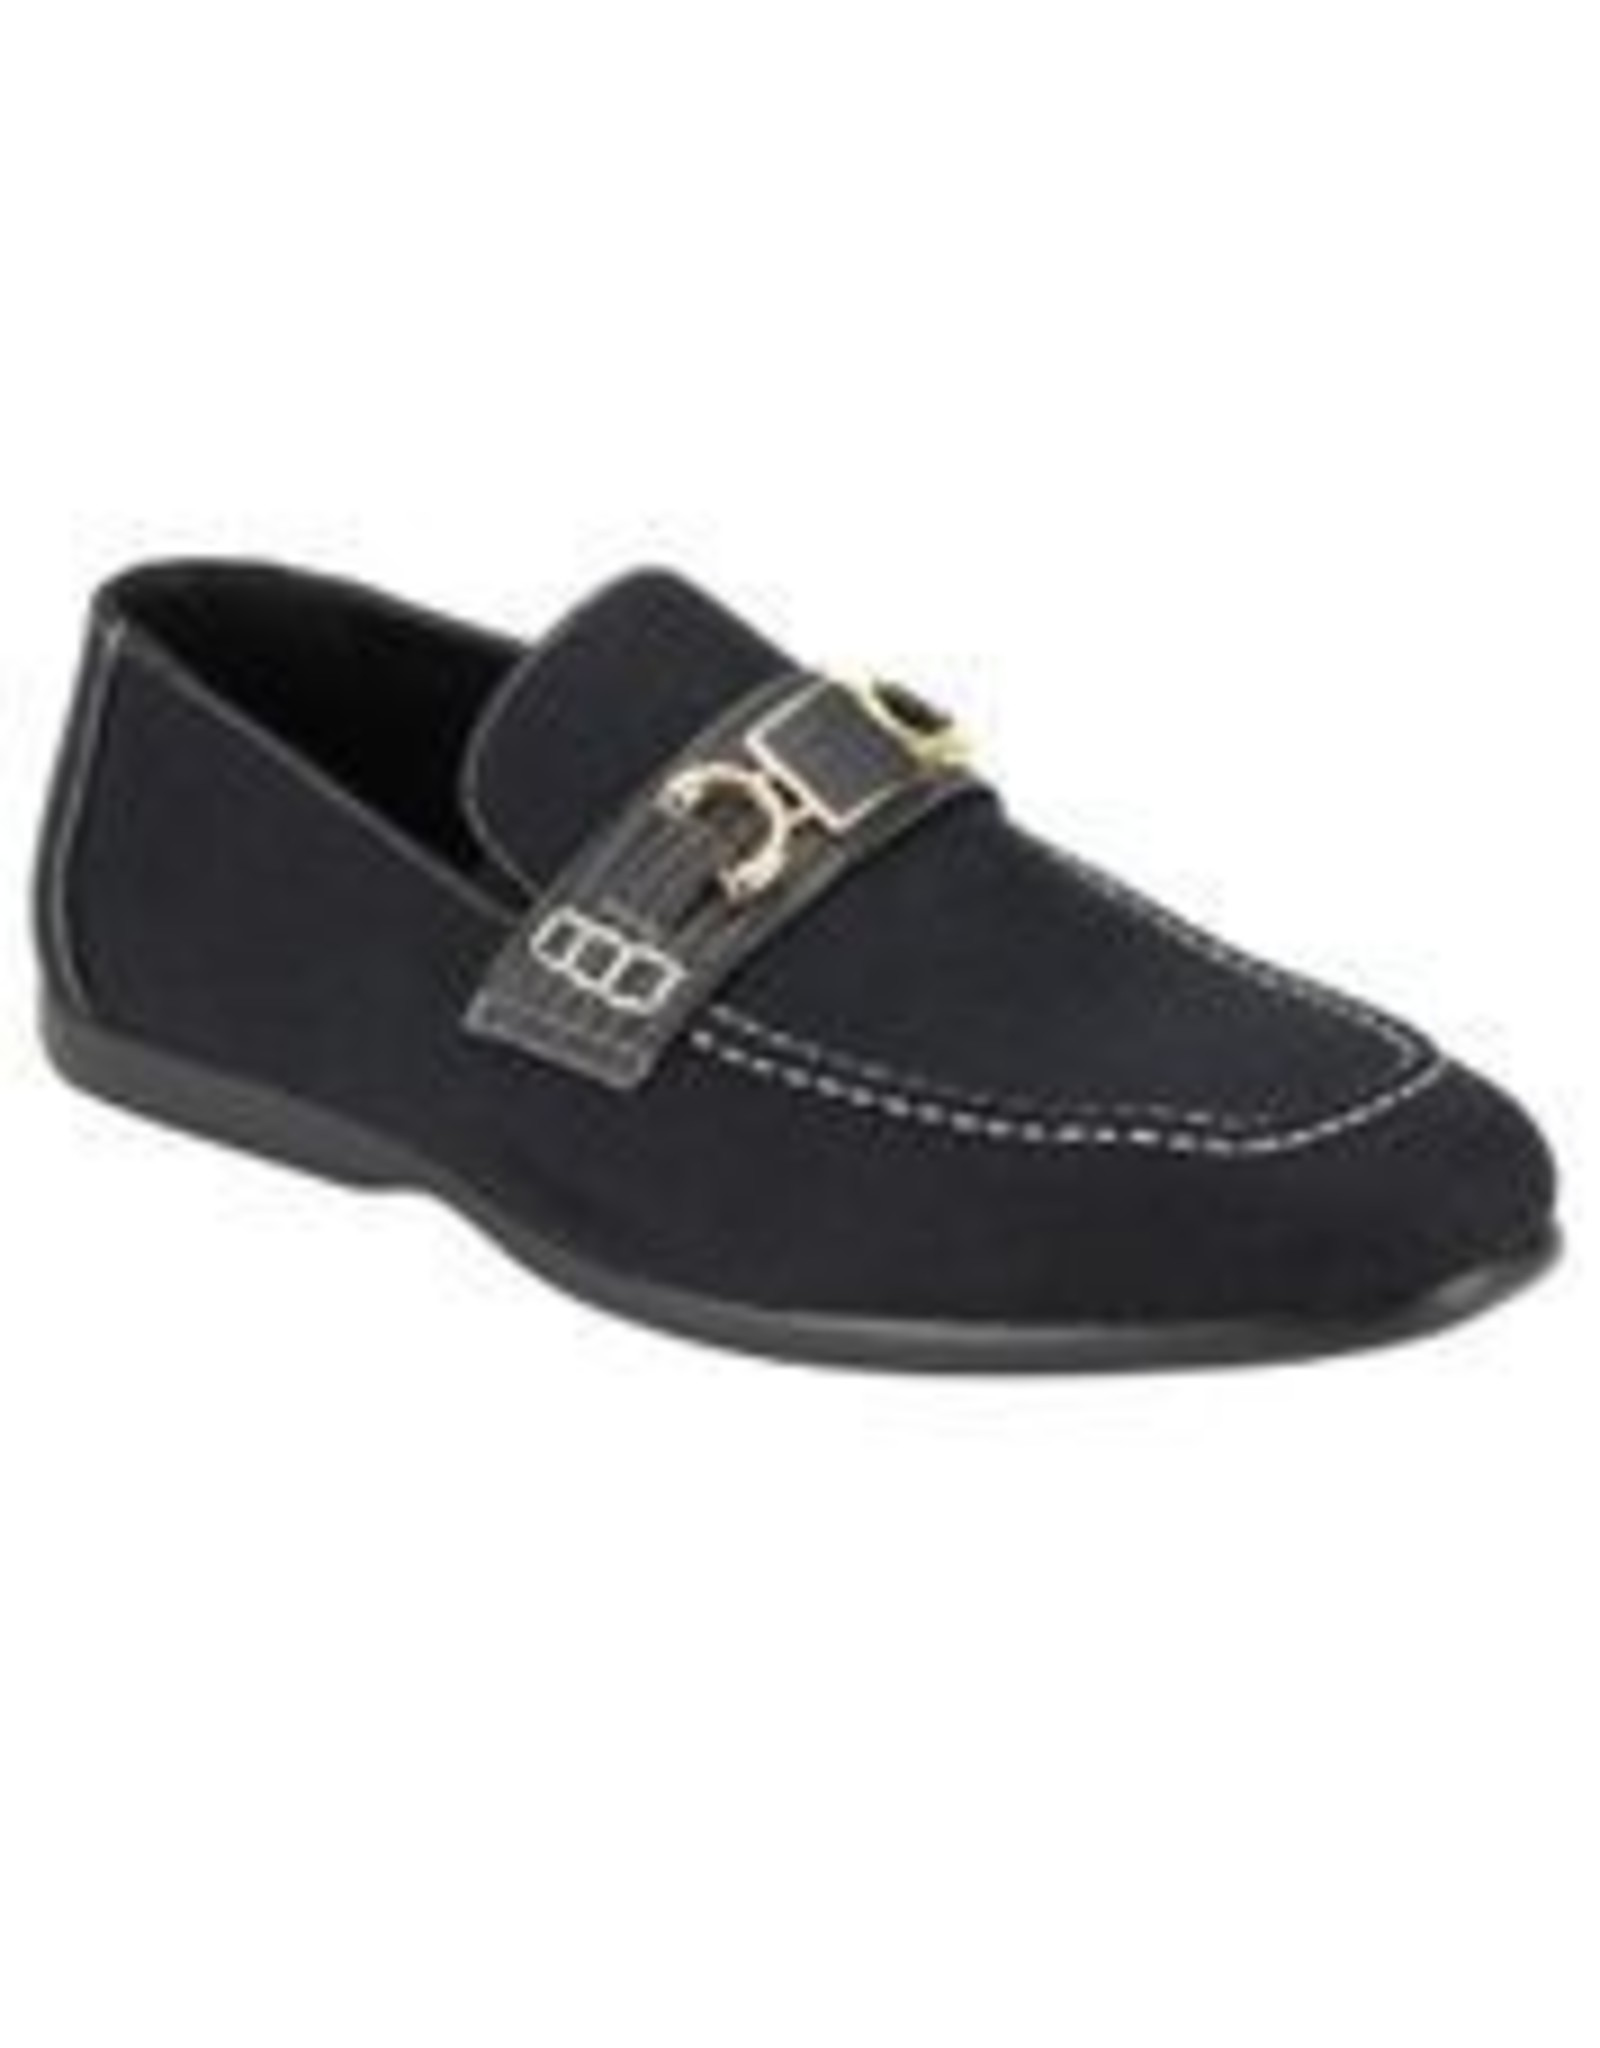 AC Casual AC Casuals Shoe - 6816 Black